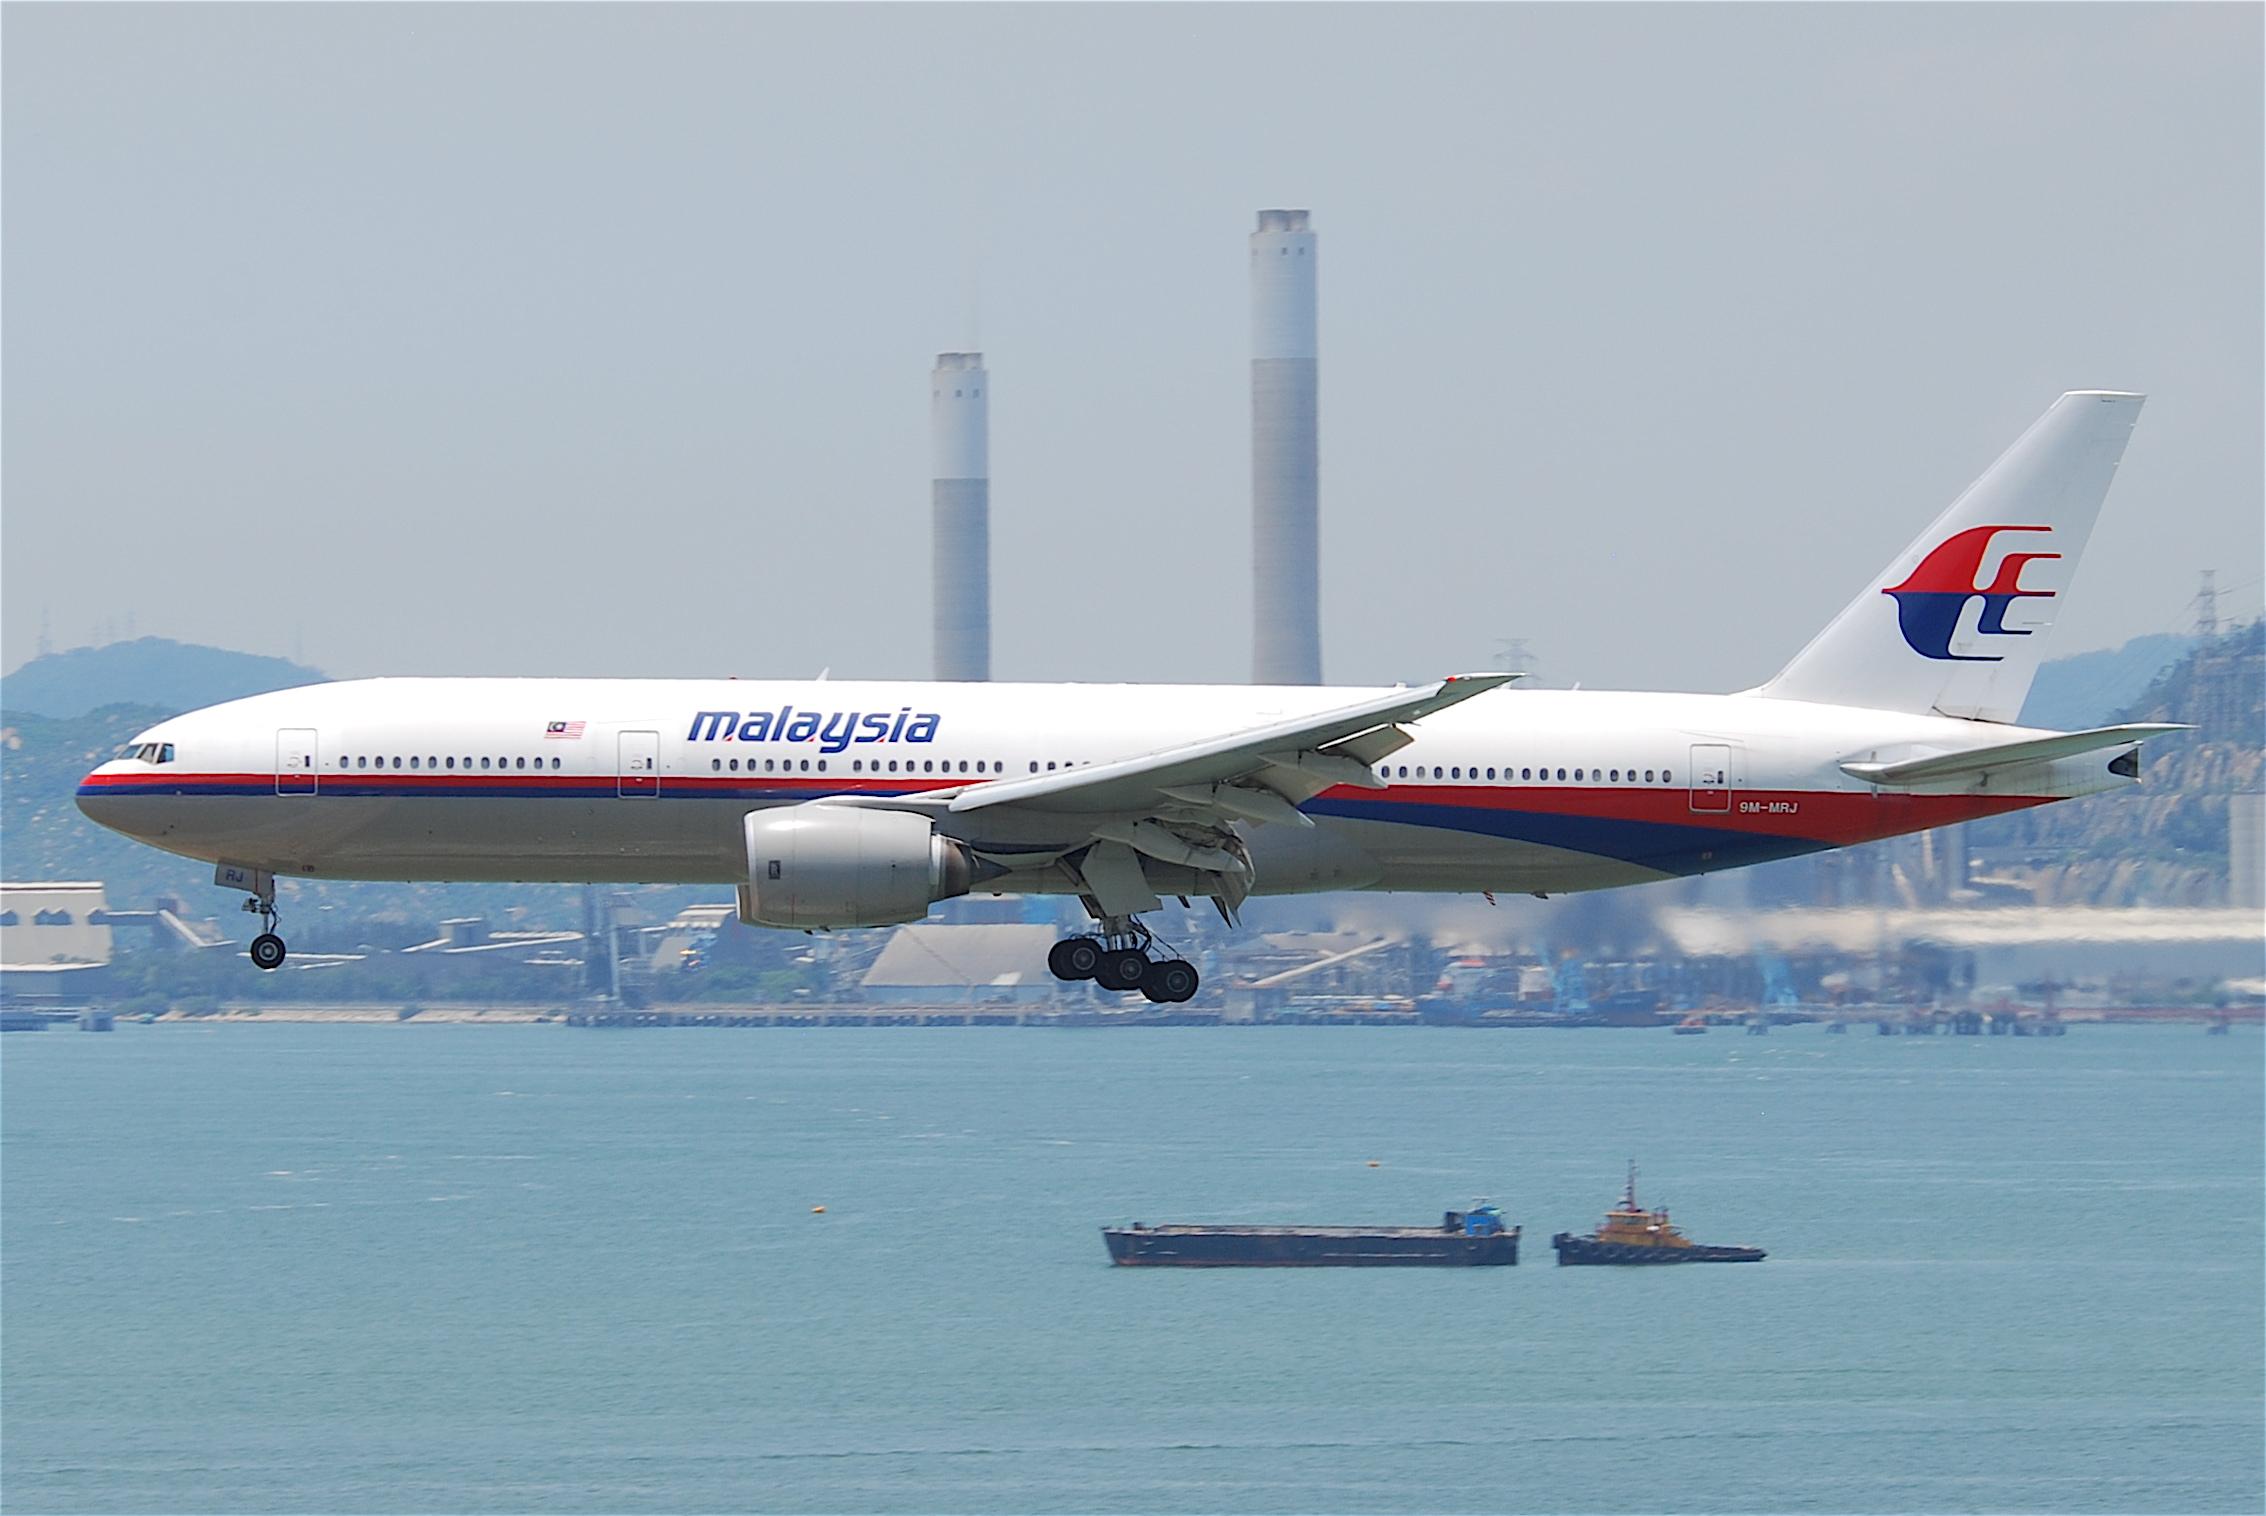 Malaysia_Airlines_Boeing_777-200ER;_9M-MRJ@HKG;04.08.2011_615lg_(6207355949).jpg (2266×1516)